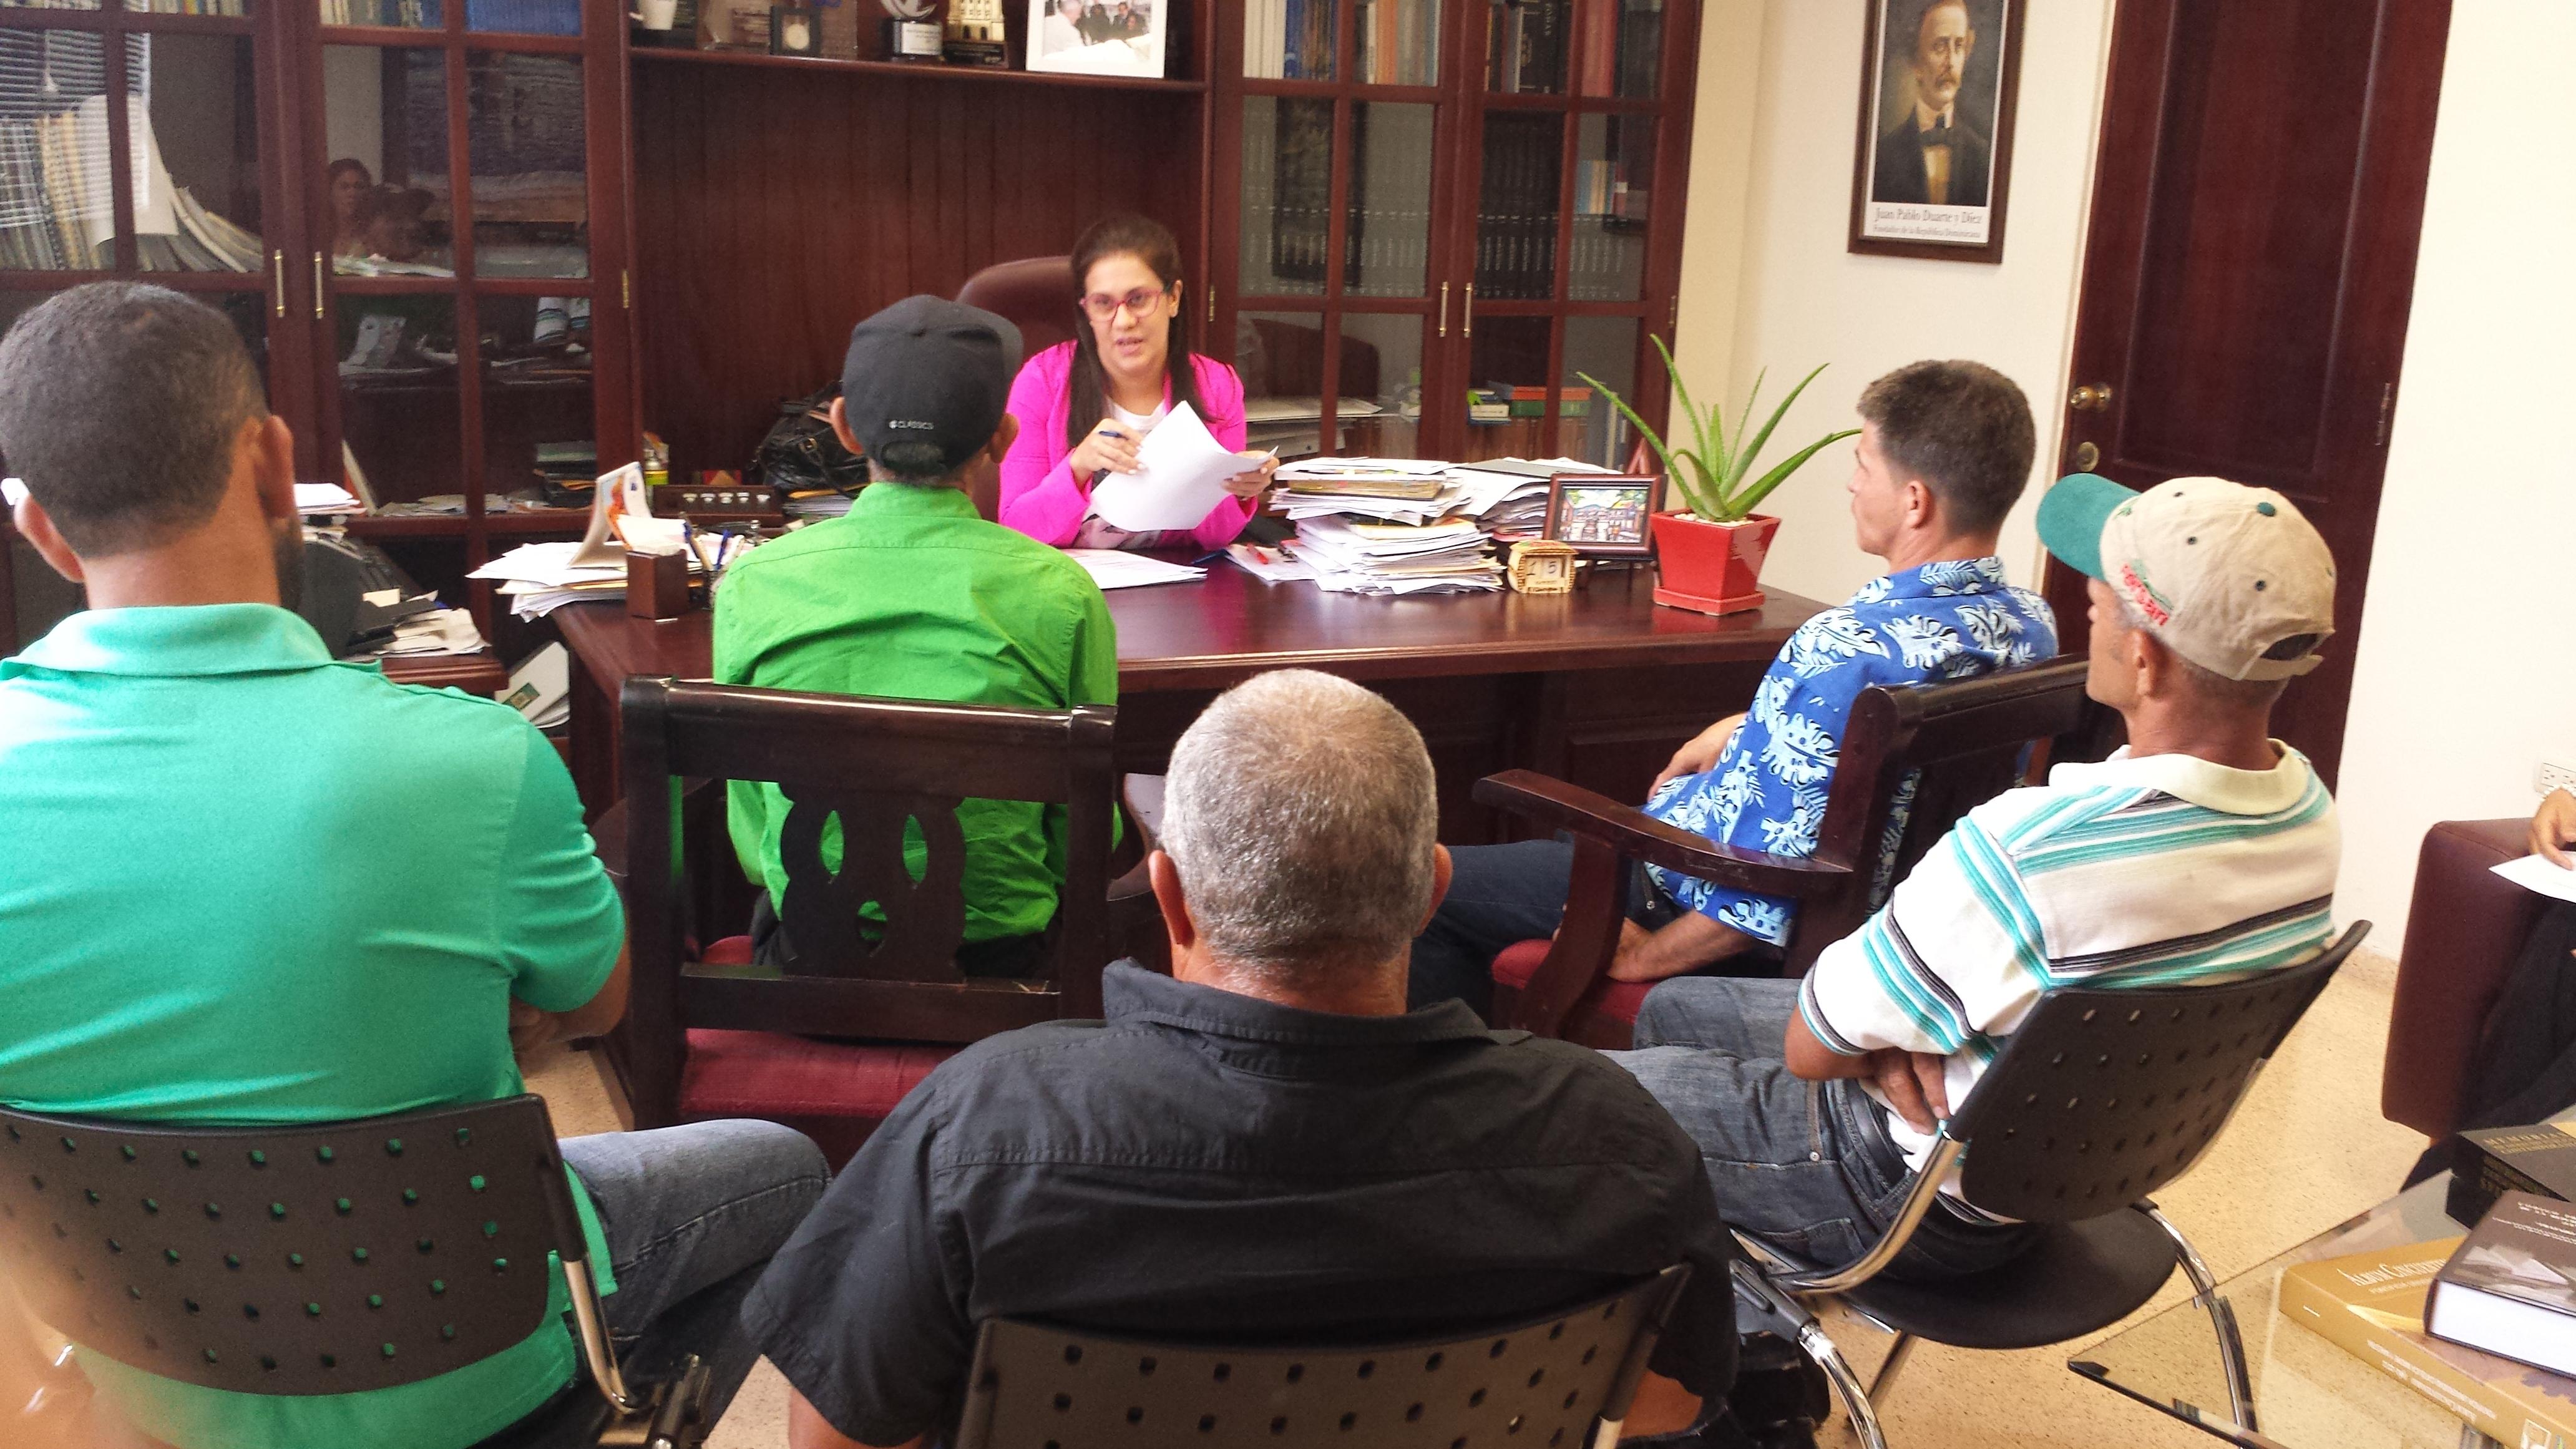 Autoridades Polonia notifican al MP dominicano sobre pago de indemnización en caso Juncalito